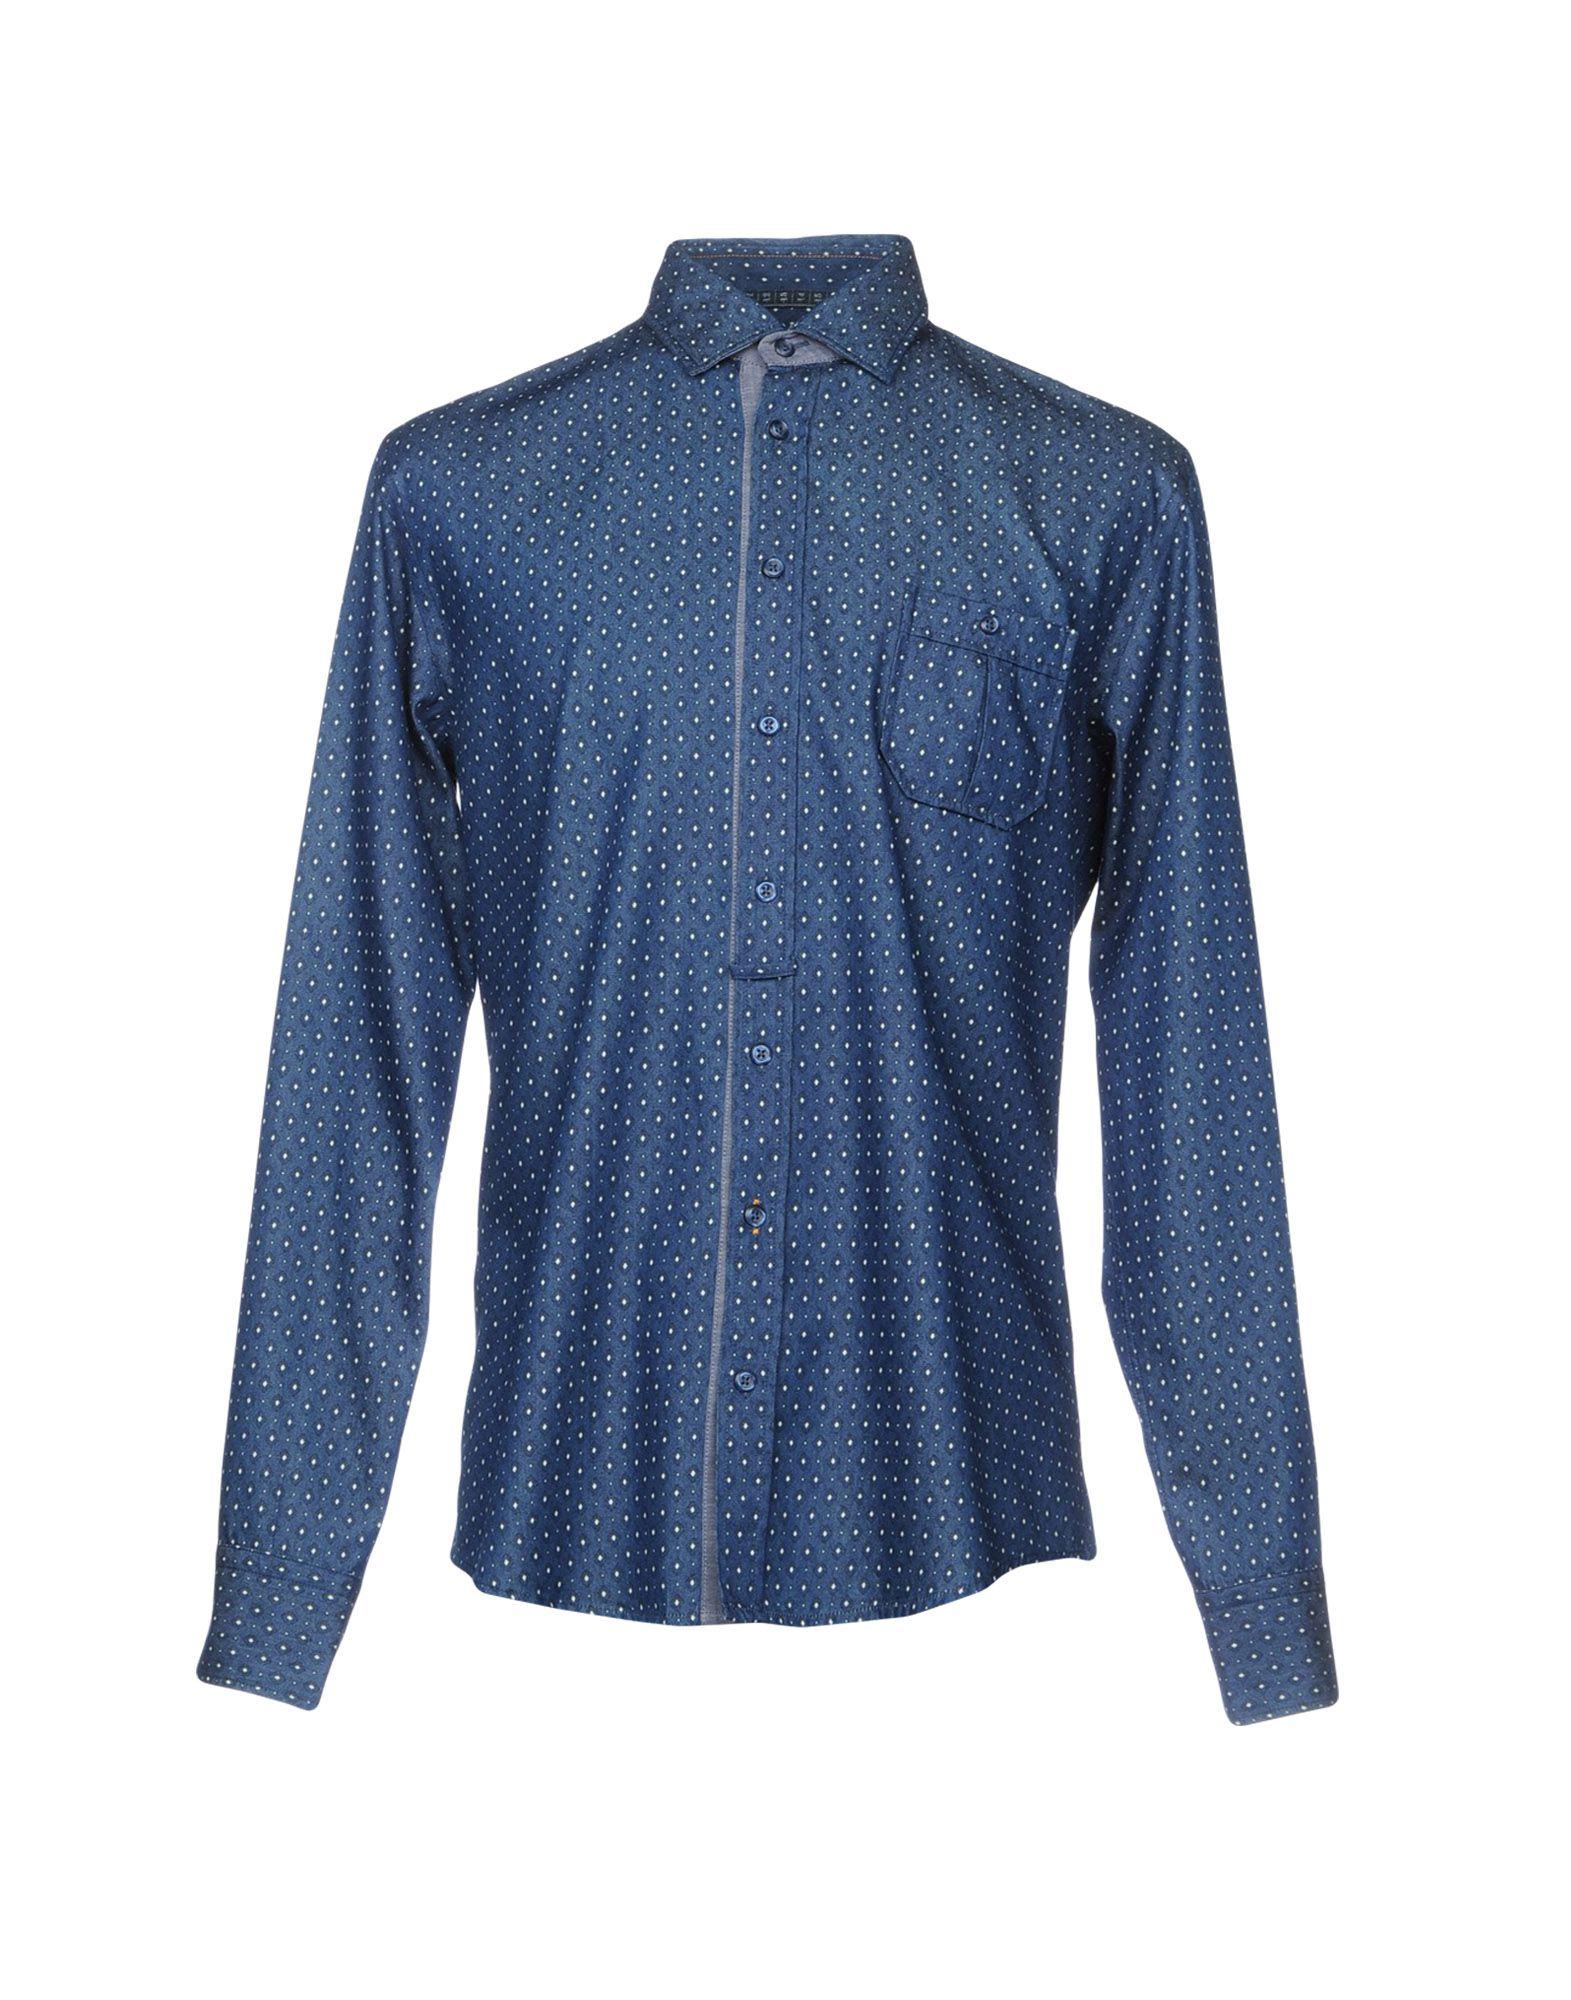 BOSS ORANGE Джинсовая рубашка